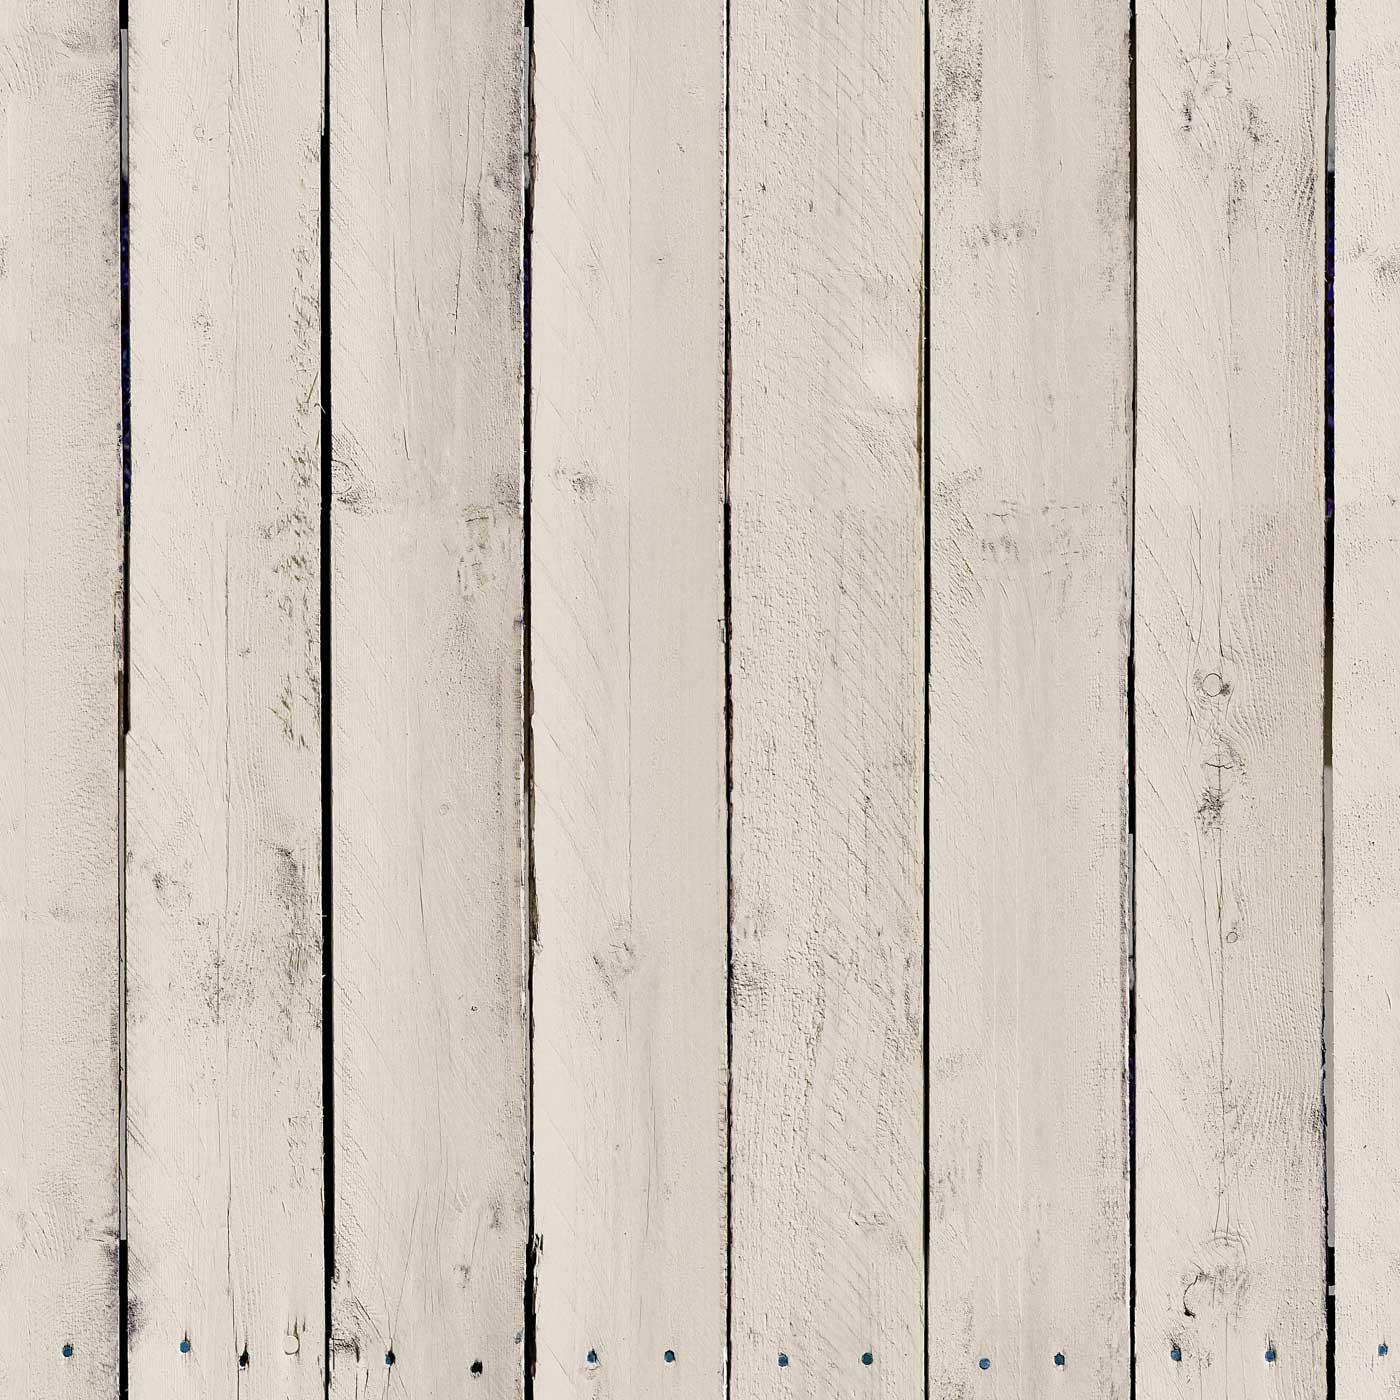 Текстуры дерева образцы деревянных структур стр № 2